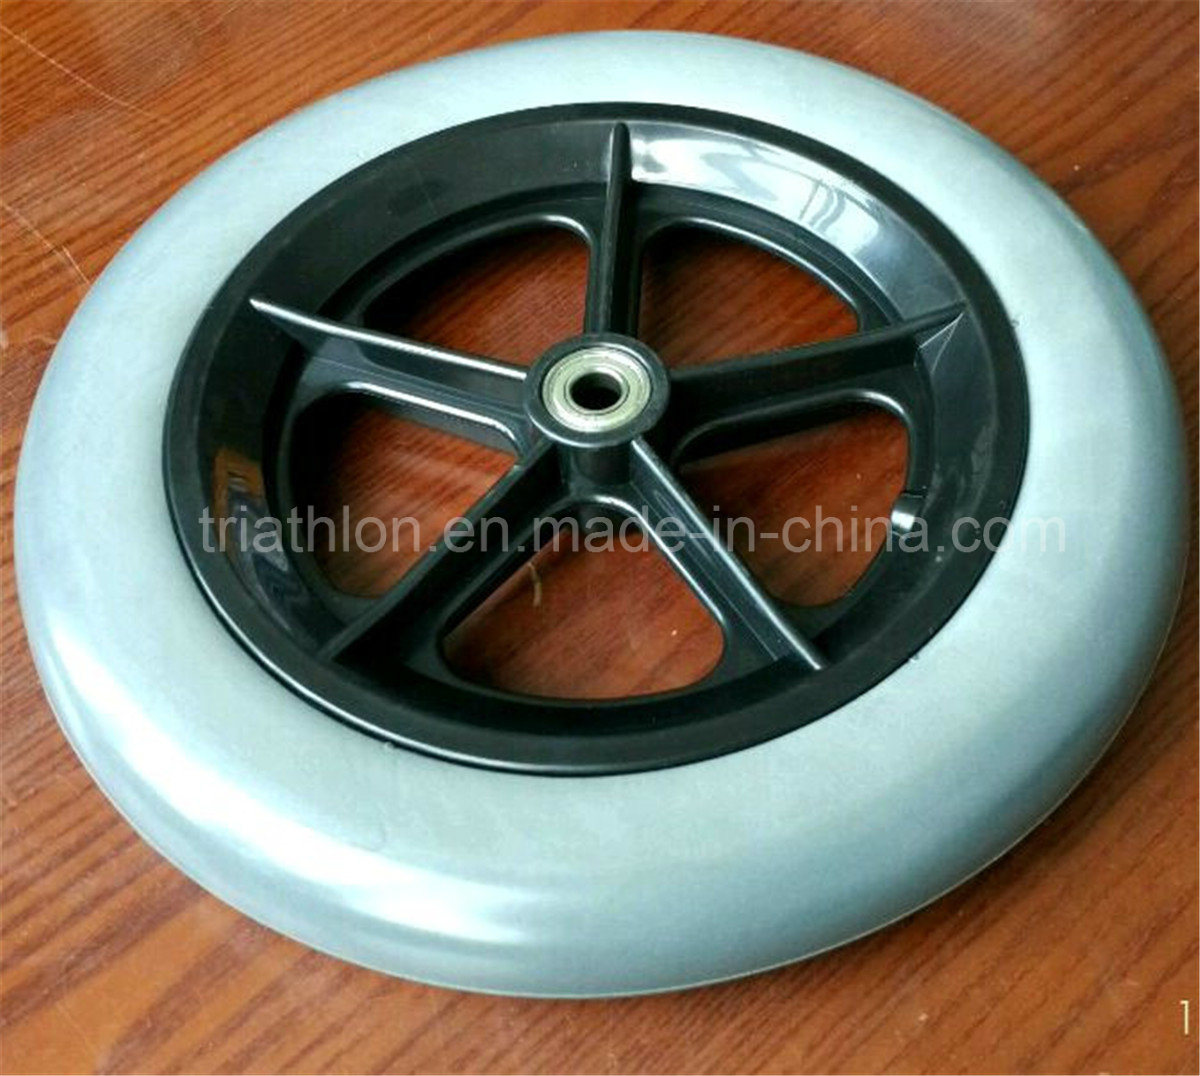 12X1.75 12X2 12X2.125 12X2.5 12X3 Flat Free Bicycle Wheelchair Foam Wheel